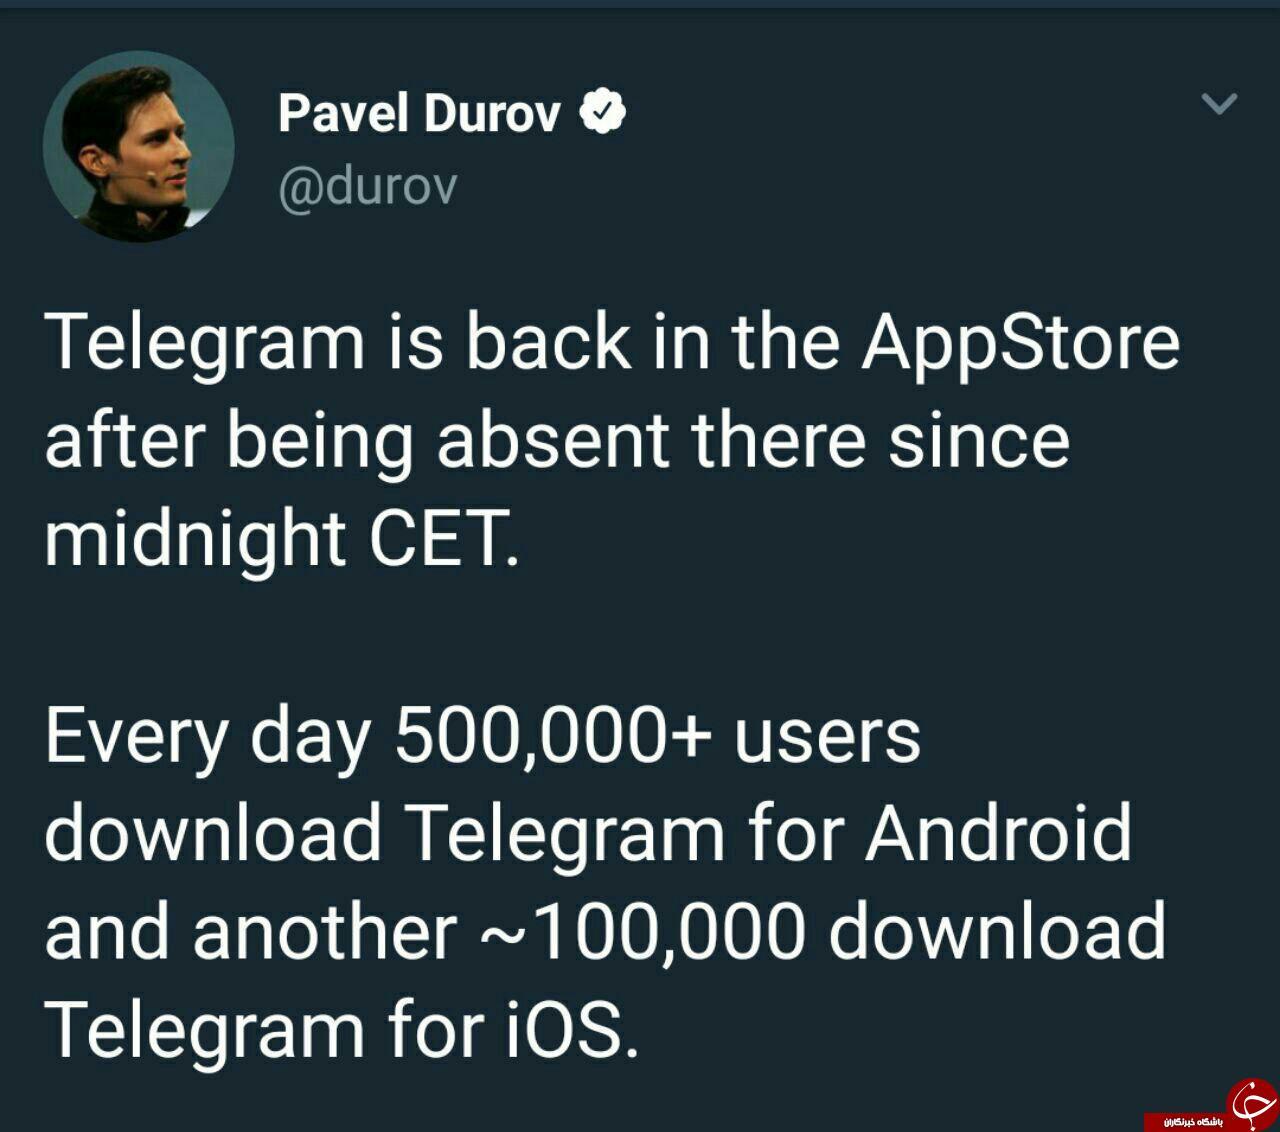 تلگرام و تلگرام X به اپ استور اپل بازگشتند